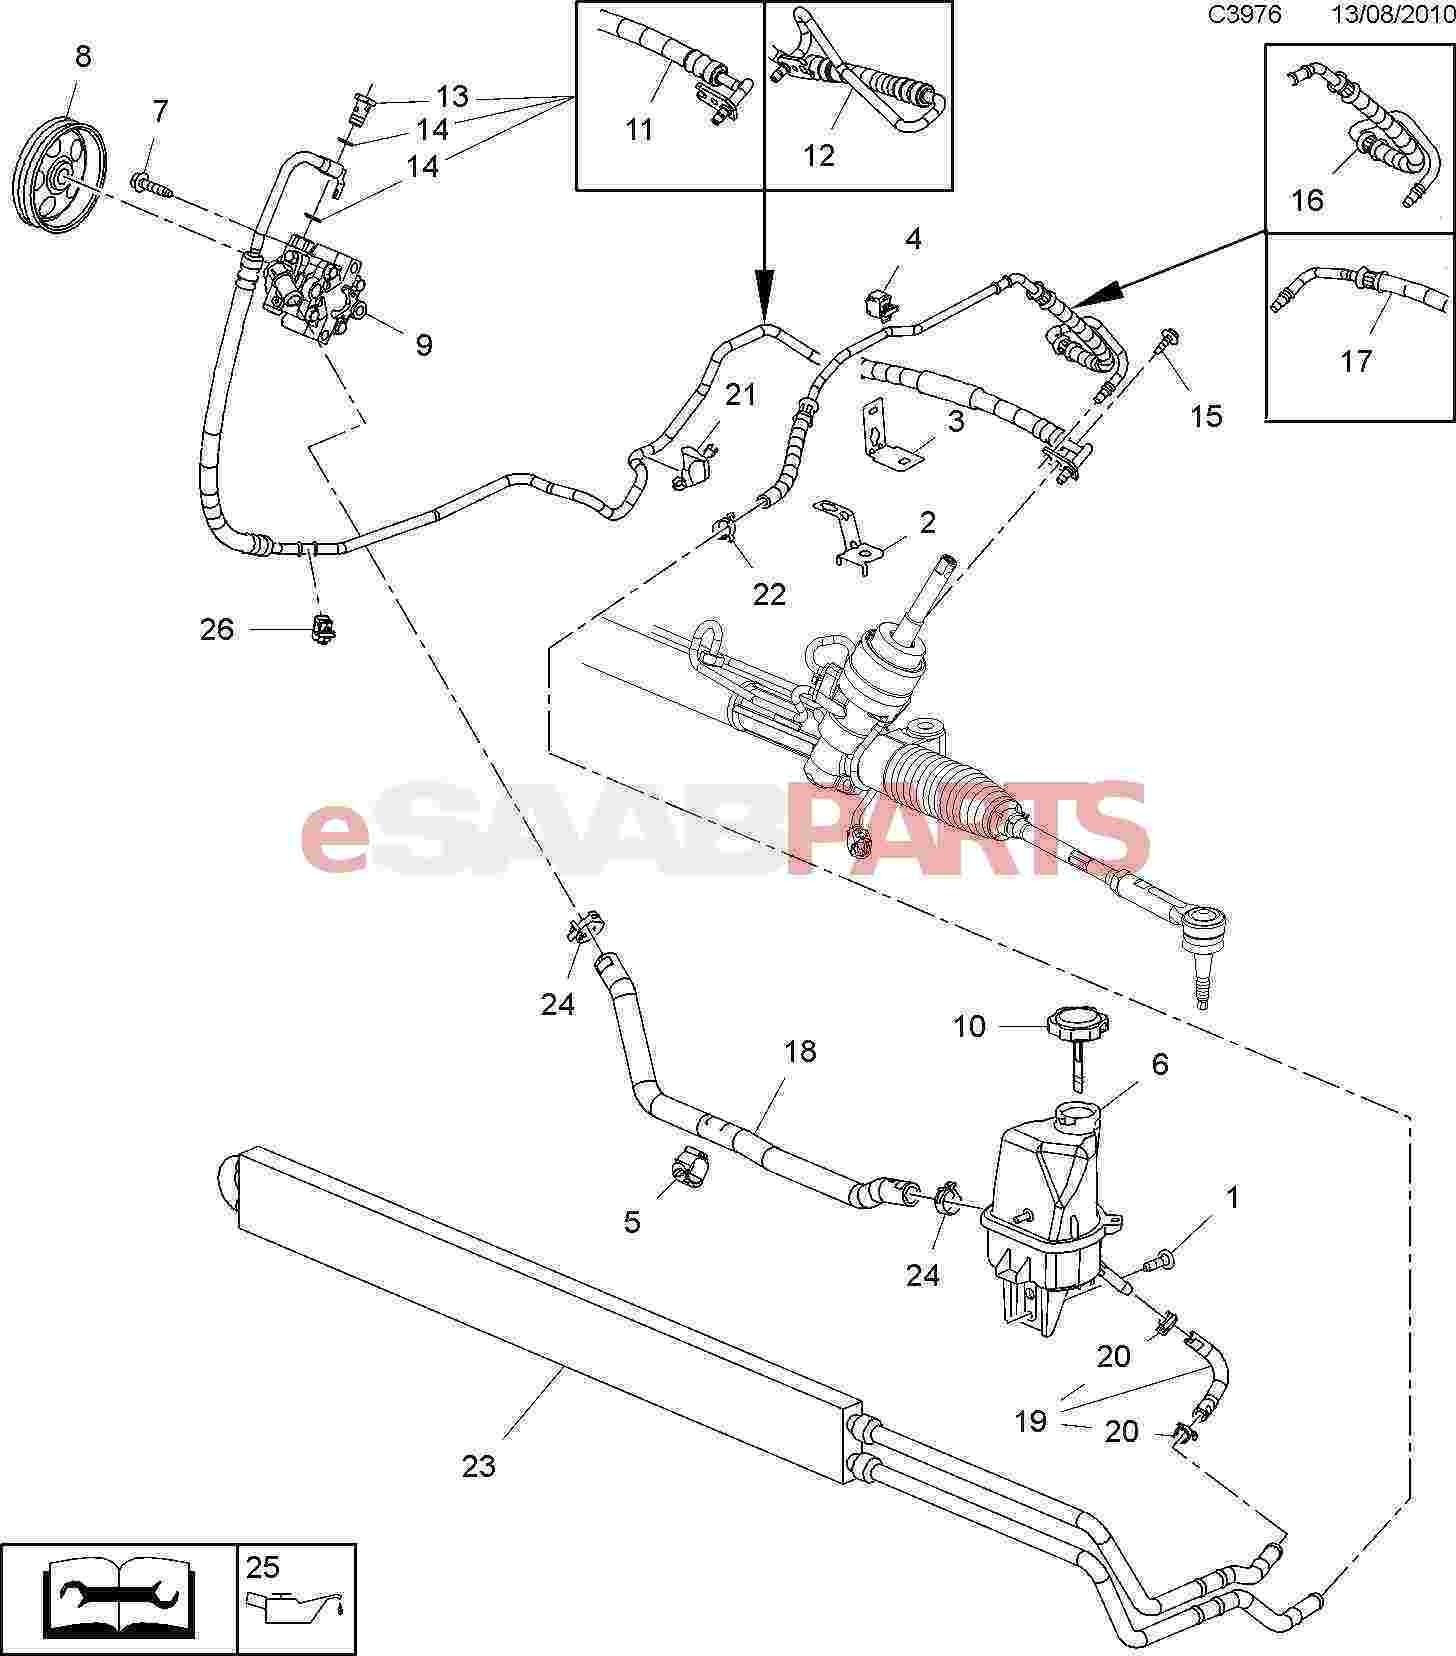 Hydraulic Steering Diagram 1956 1957 1958 Cadillac Power Steering